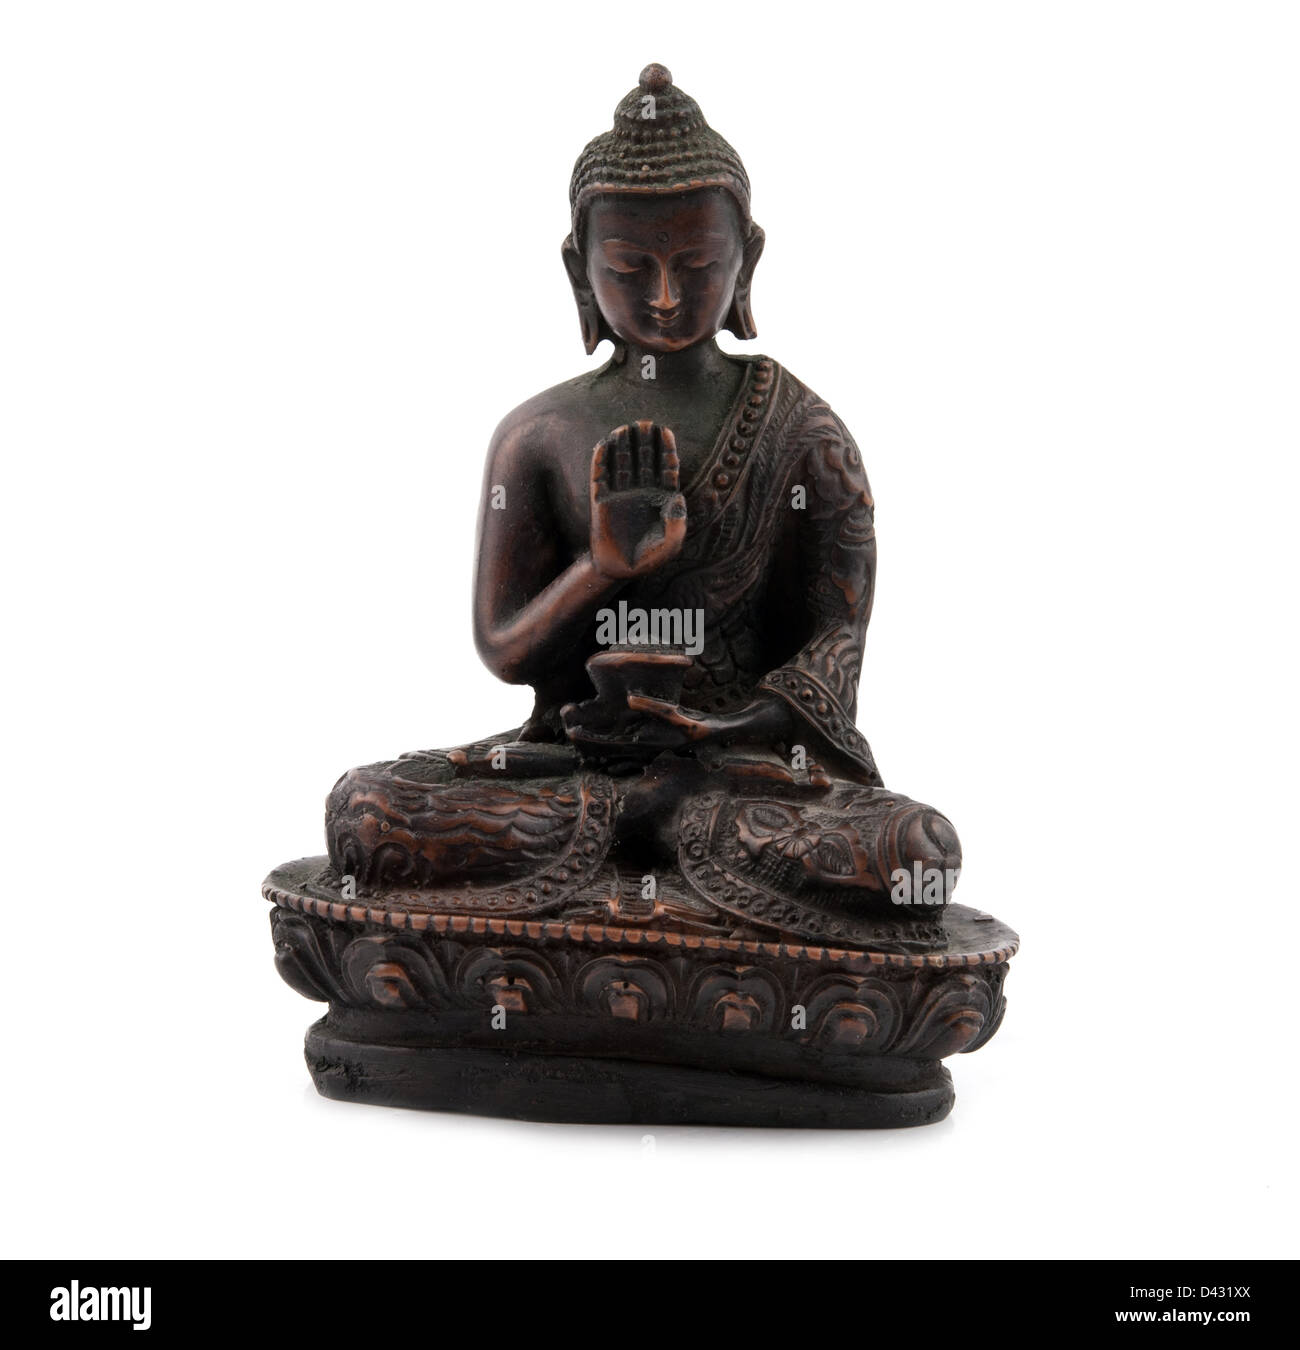 a bronze statuette of Buddha - Stock Image